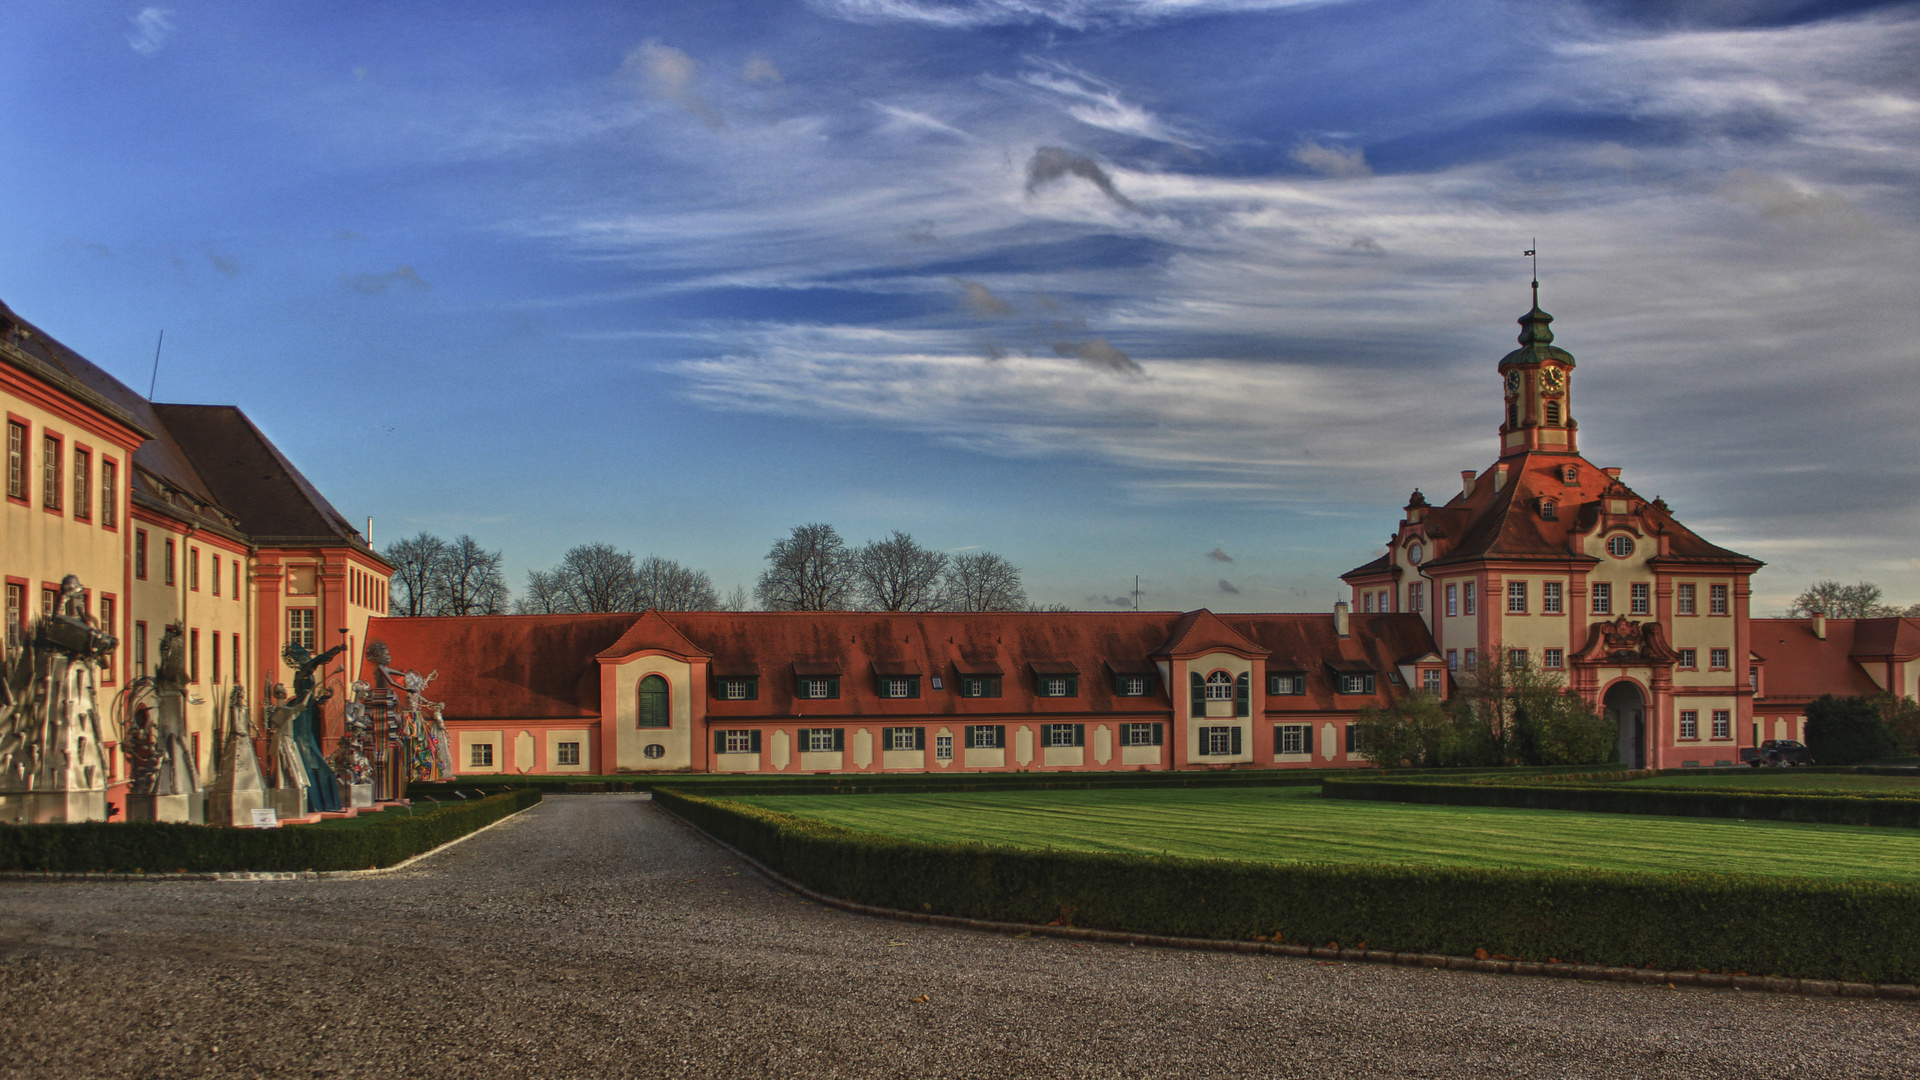 Schloßgarten Altshausen